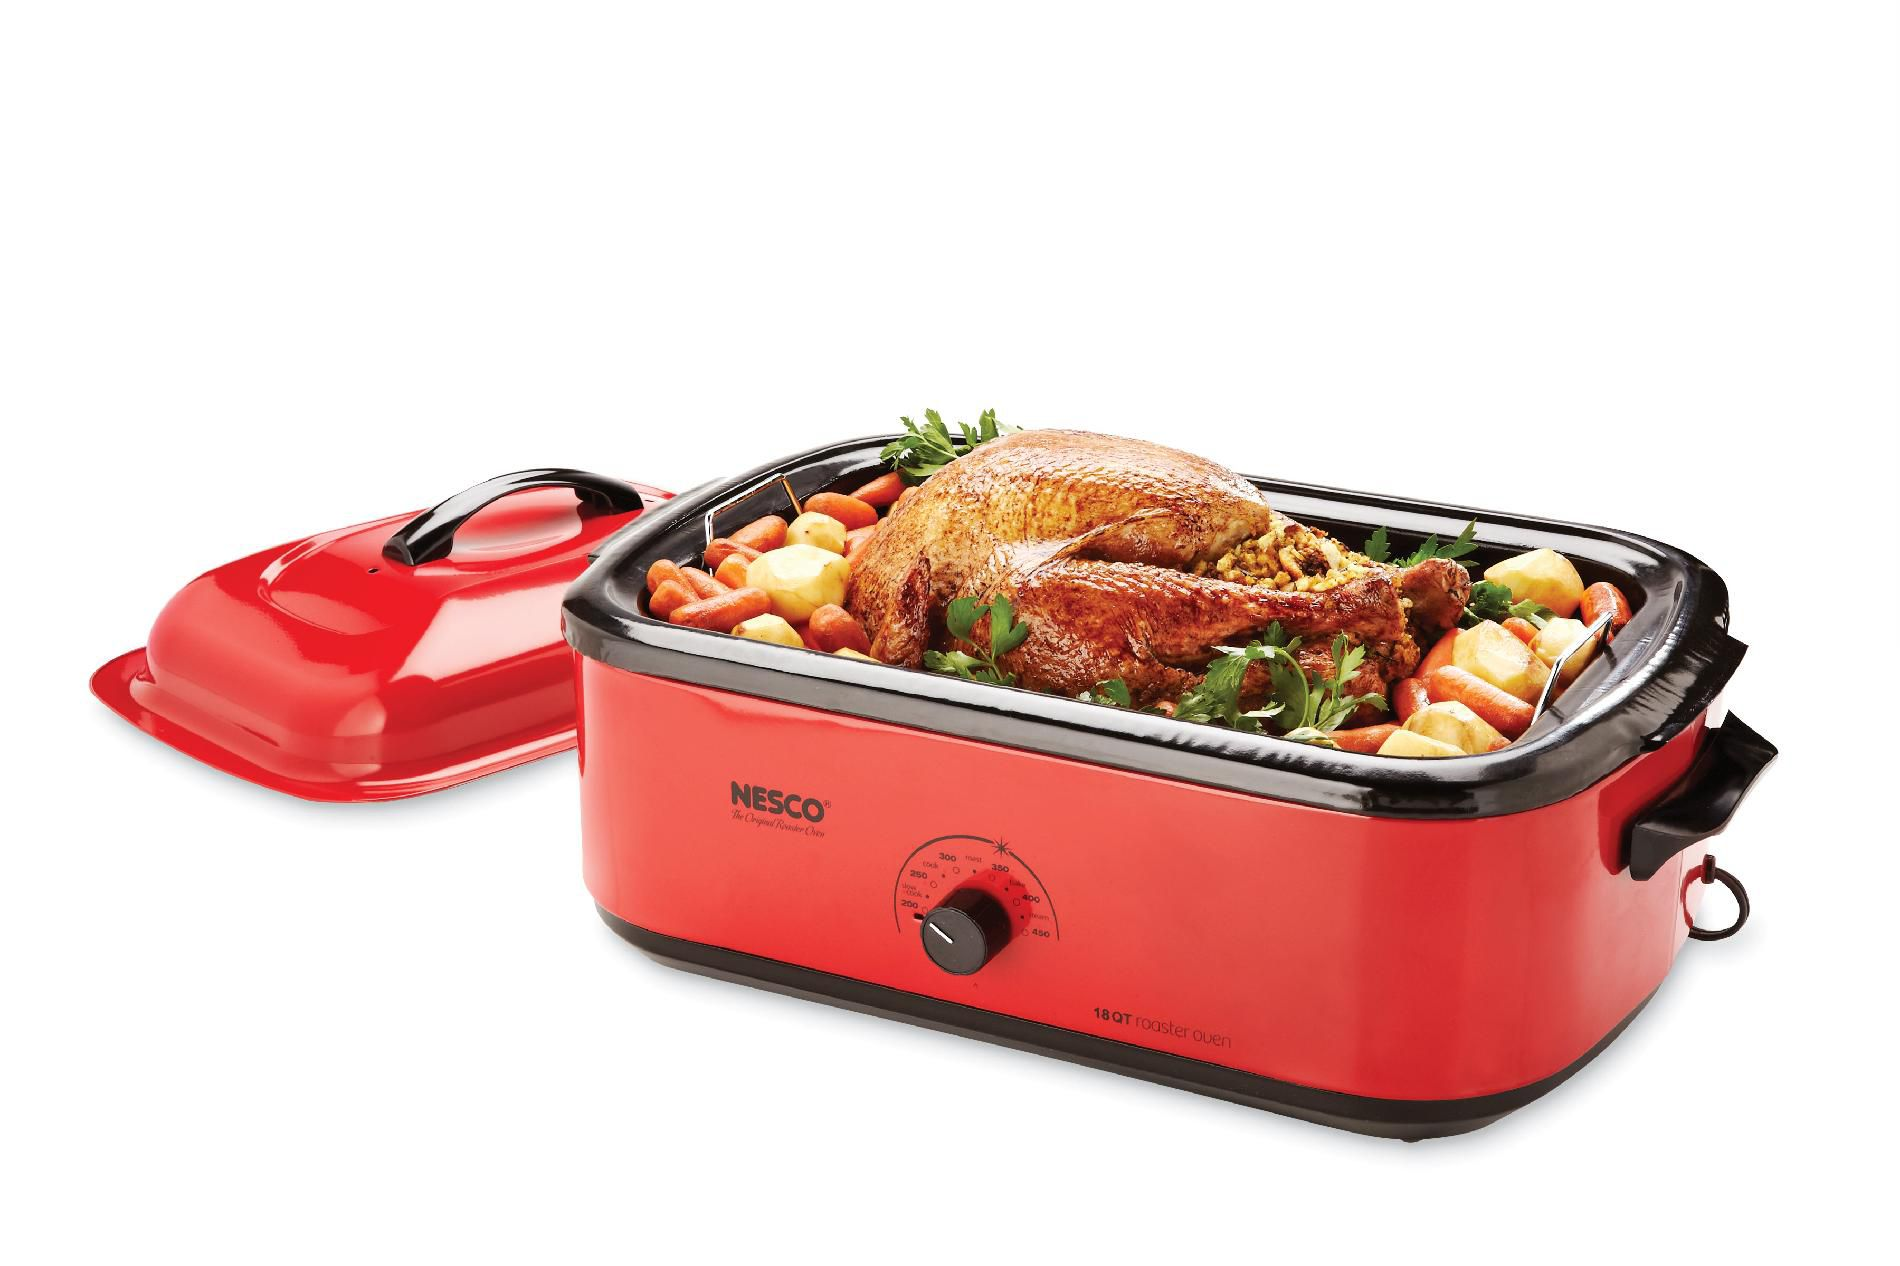 Nesco Classic Roaster Oven, 18-Quart, Porcelain Cookwell